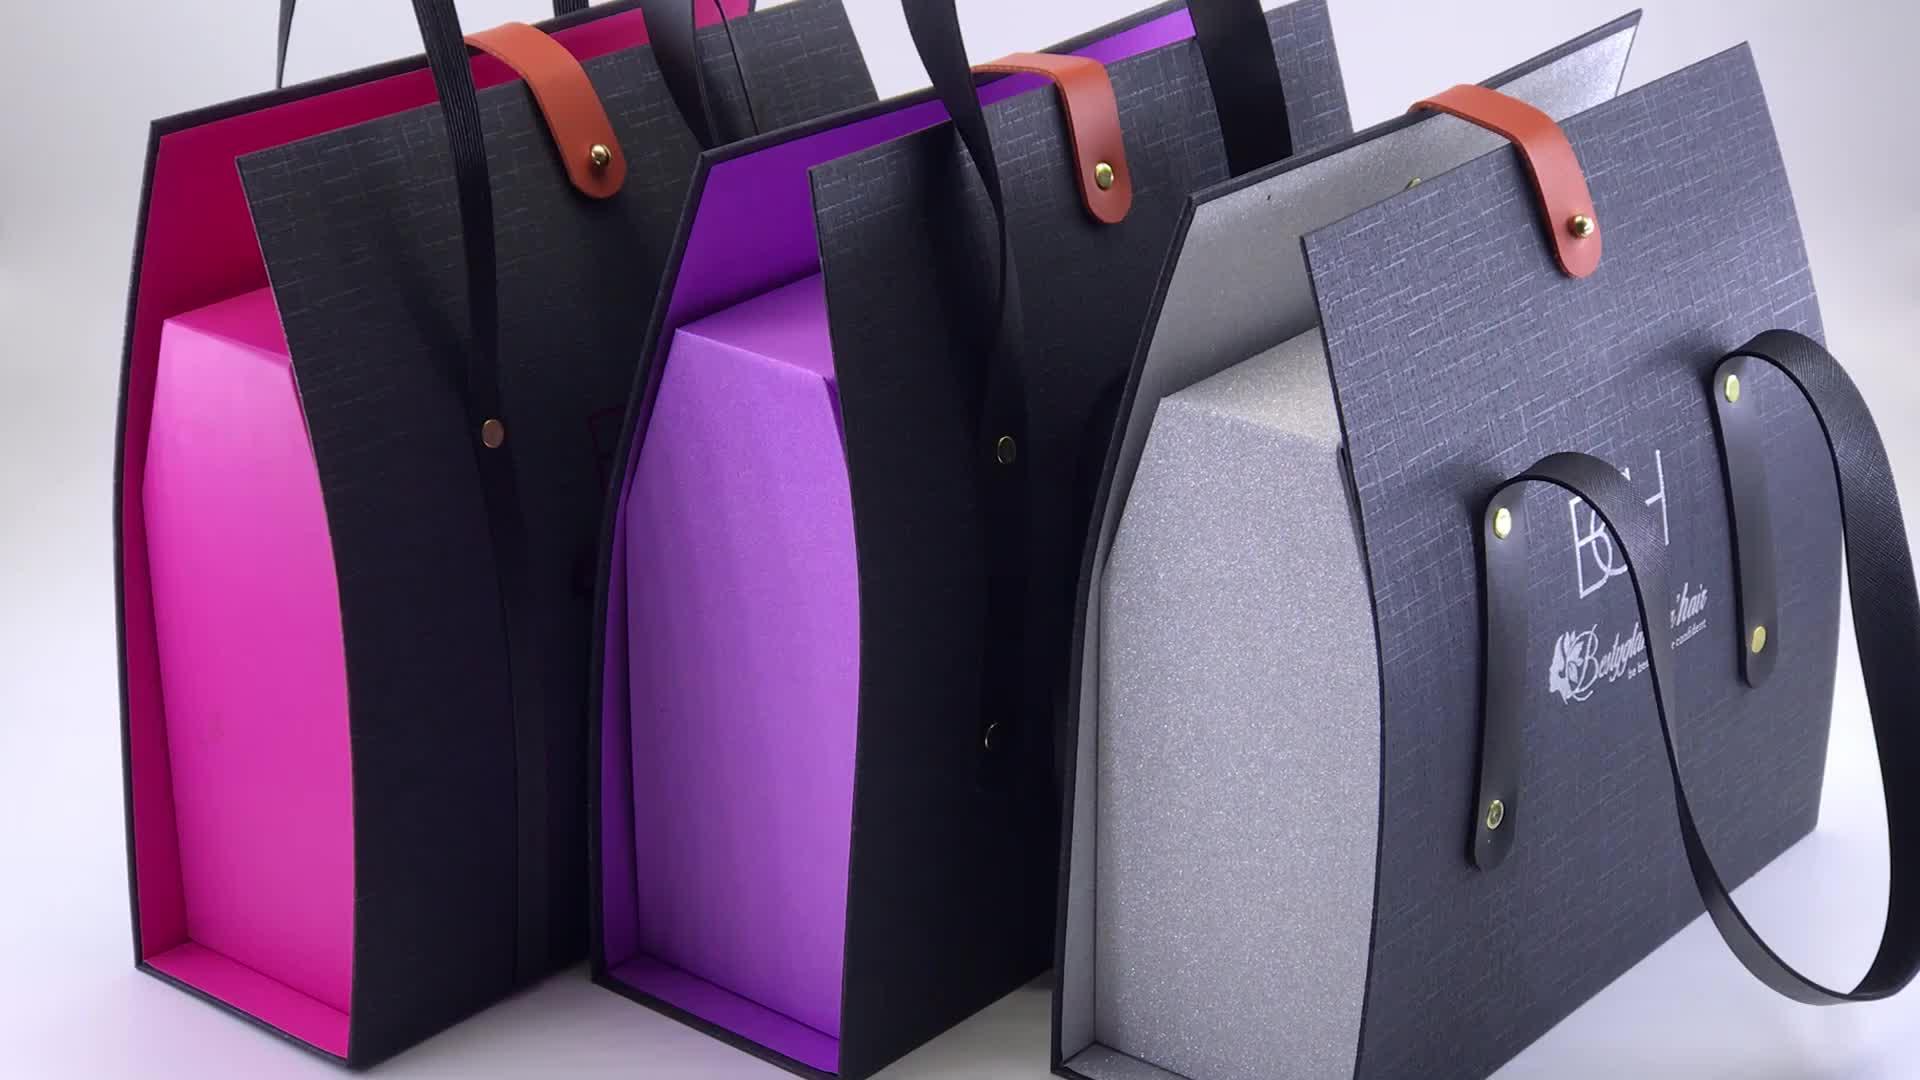 custom creative luxury matte black Cardboard boxes with metal buckles belt handle for human hair wig or hair extension packaging